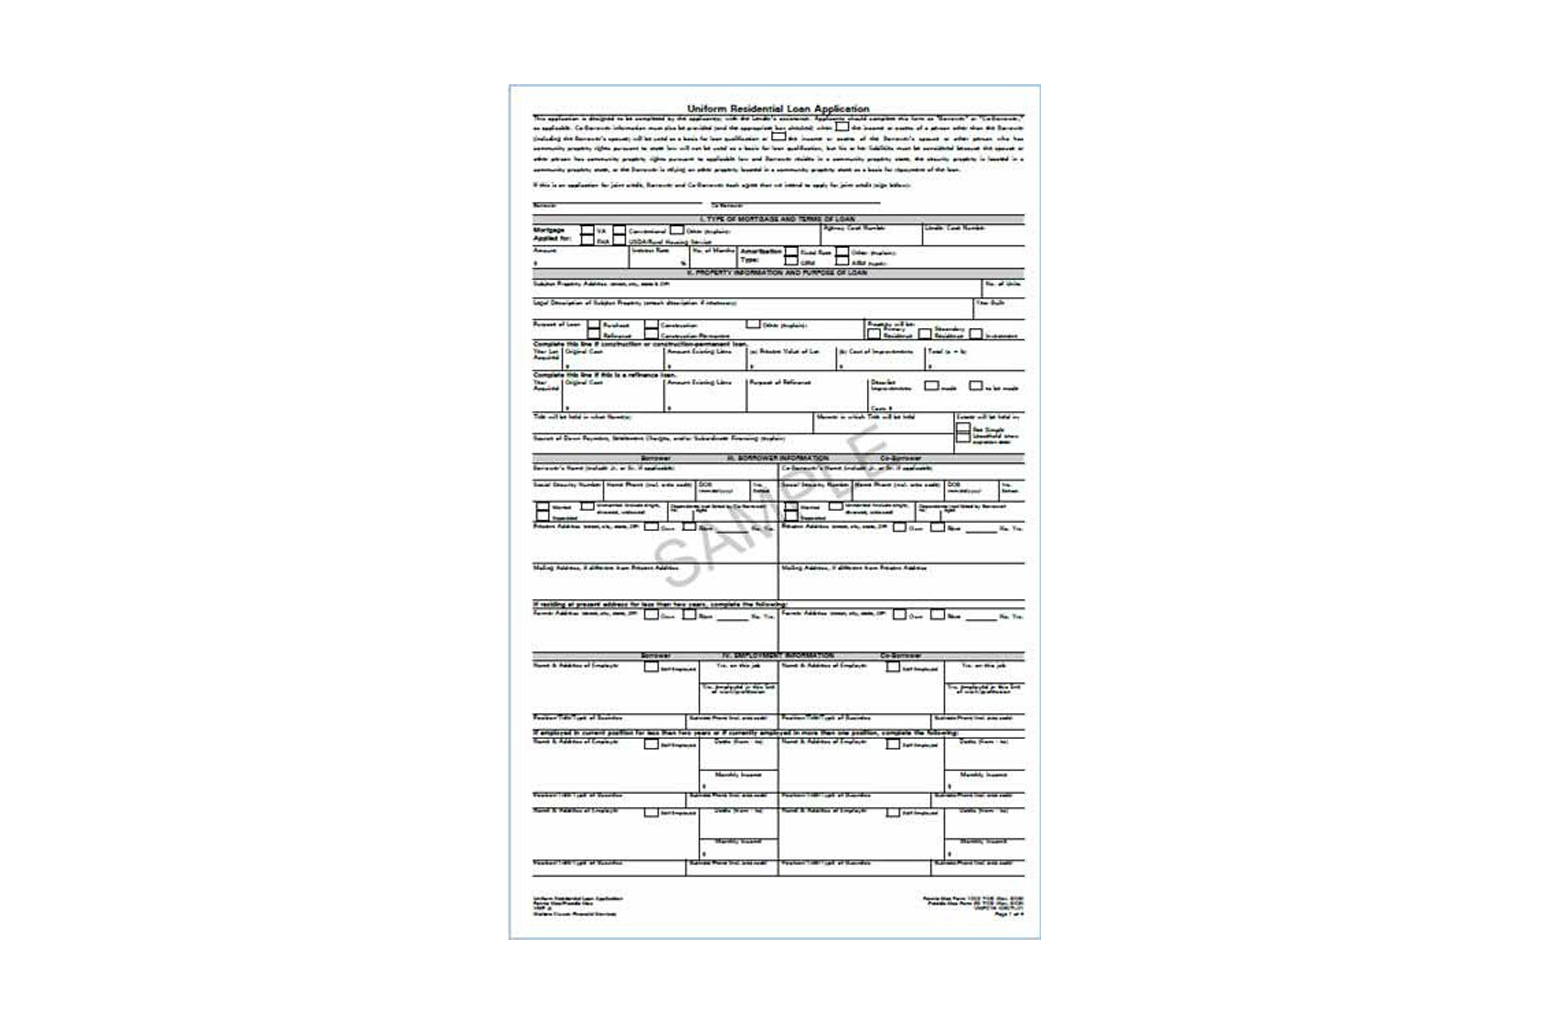 Uniform Residential Loan Application - FNMA